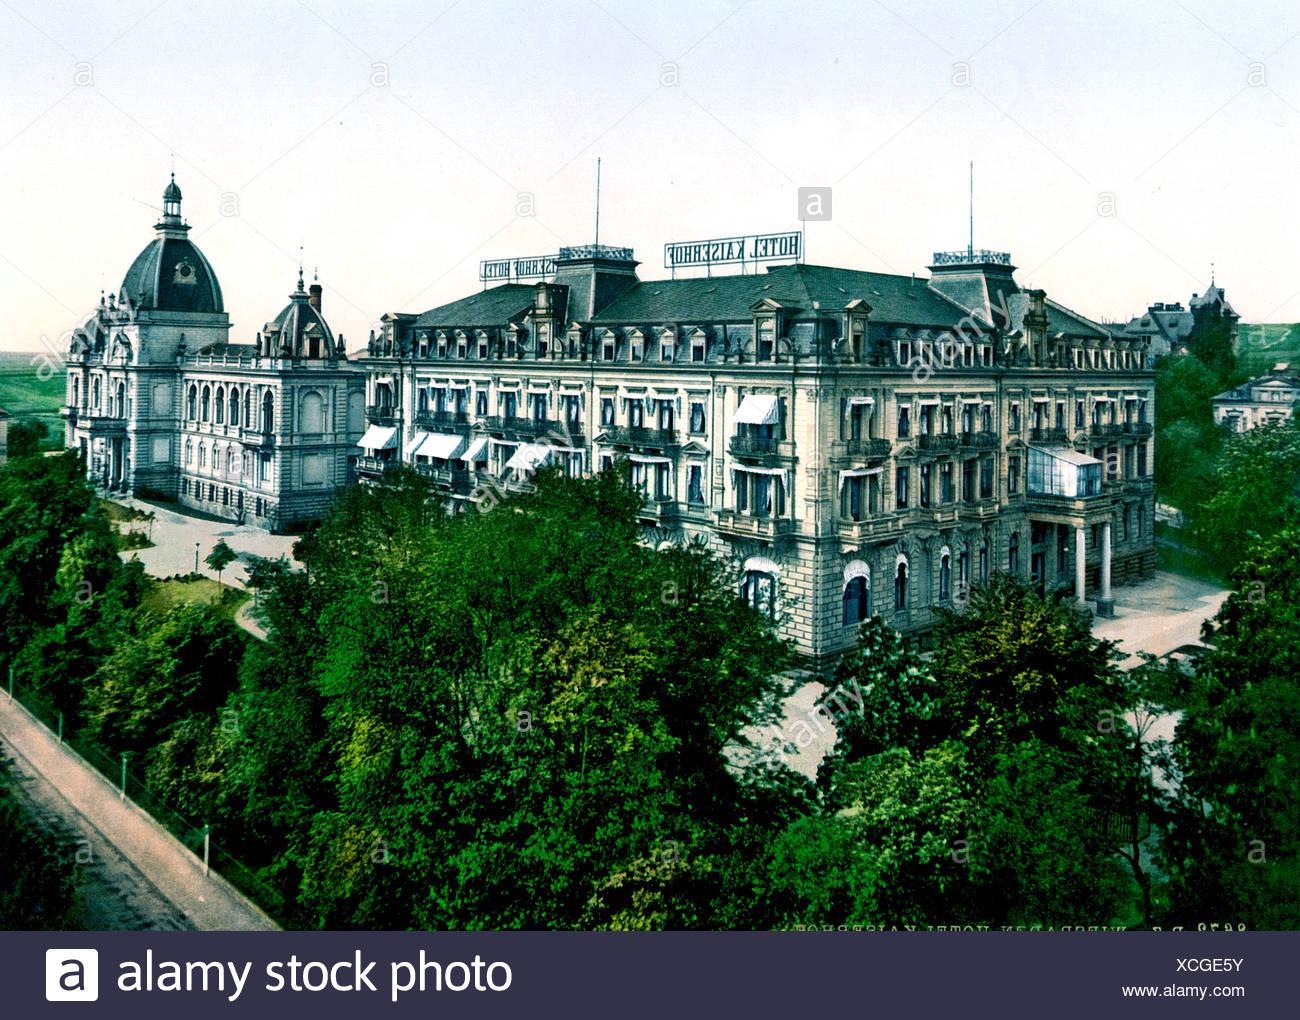 Bad Wiesbaden